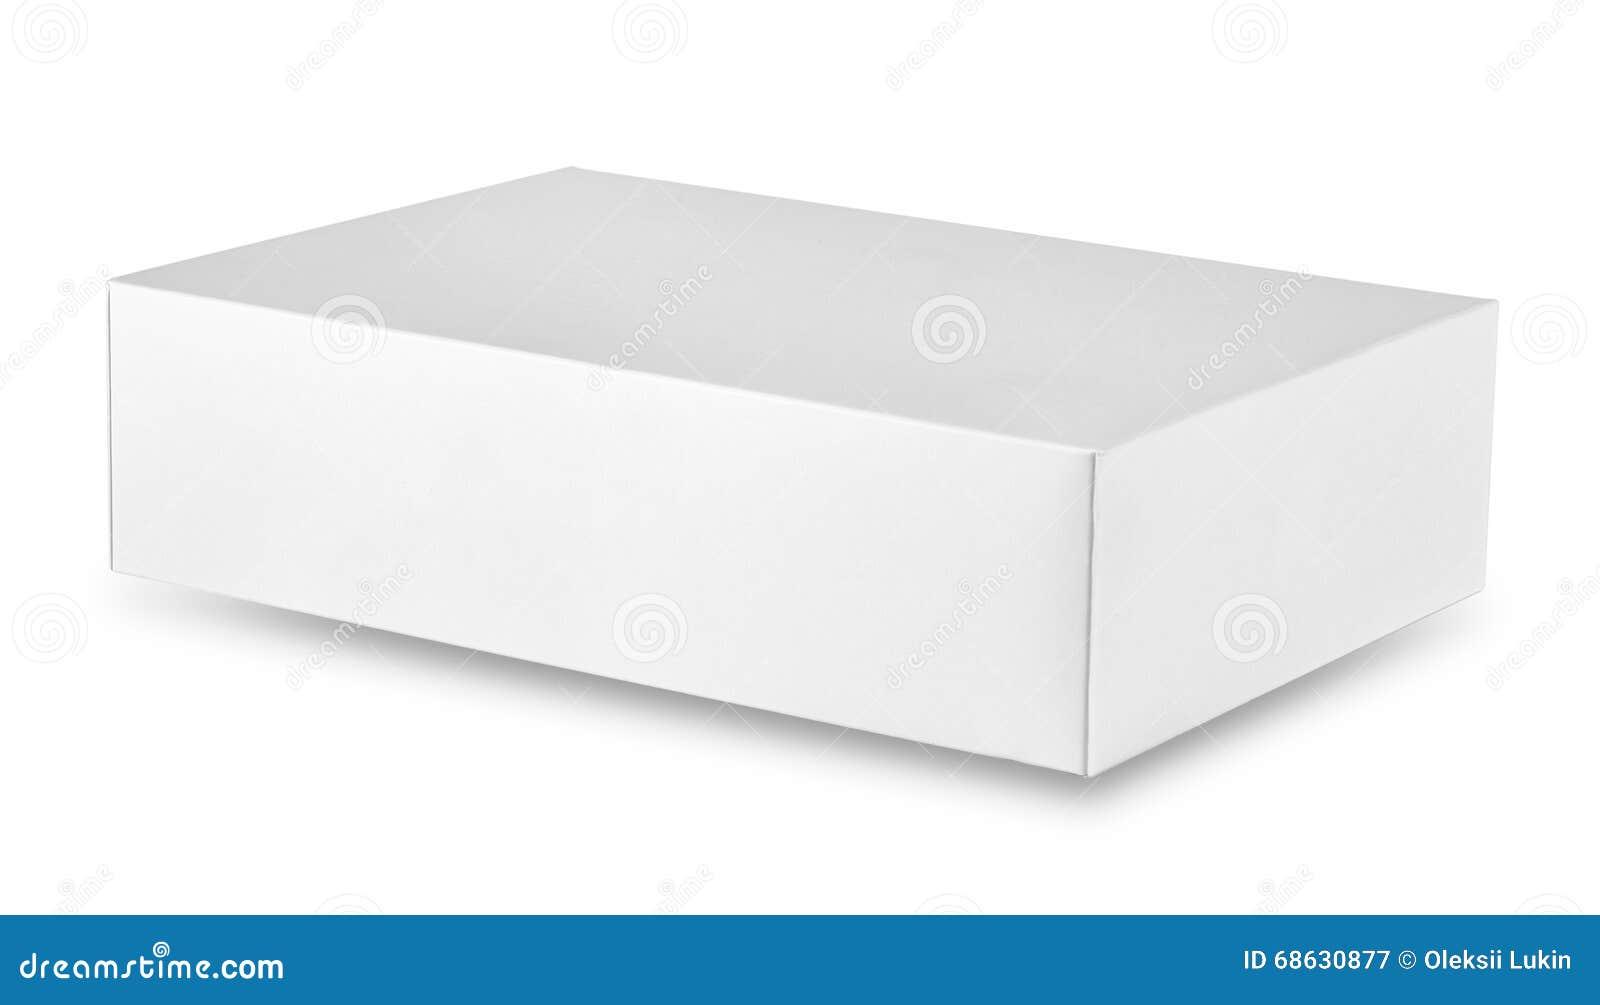 bo te en carton rectangulaire blanche ferm e photo stock image 68630877. Black Bedroom Furniture Sets. Home Design Ideas